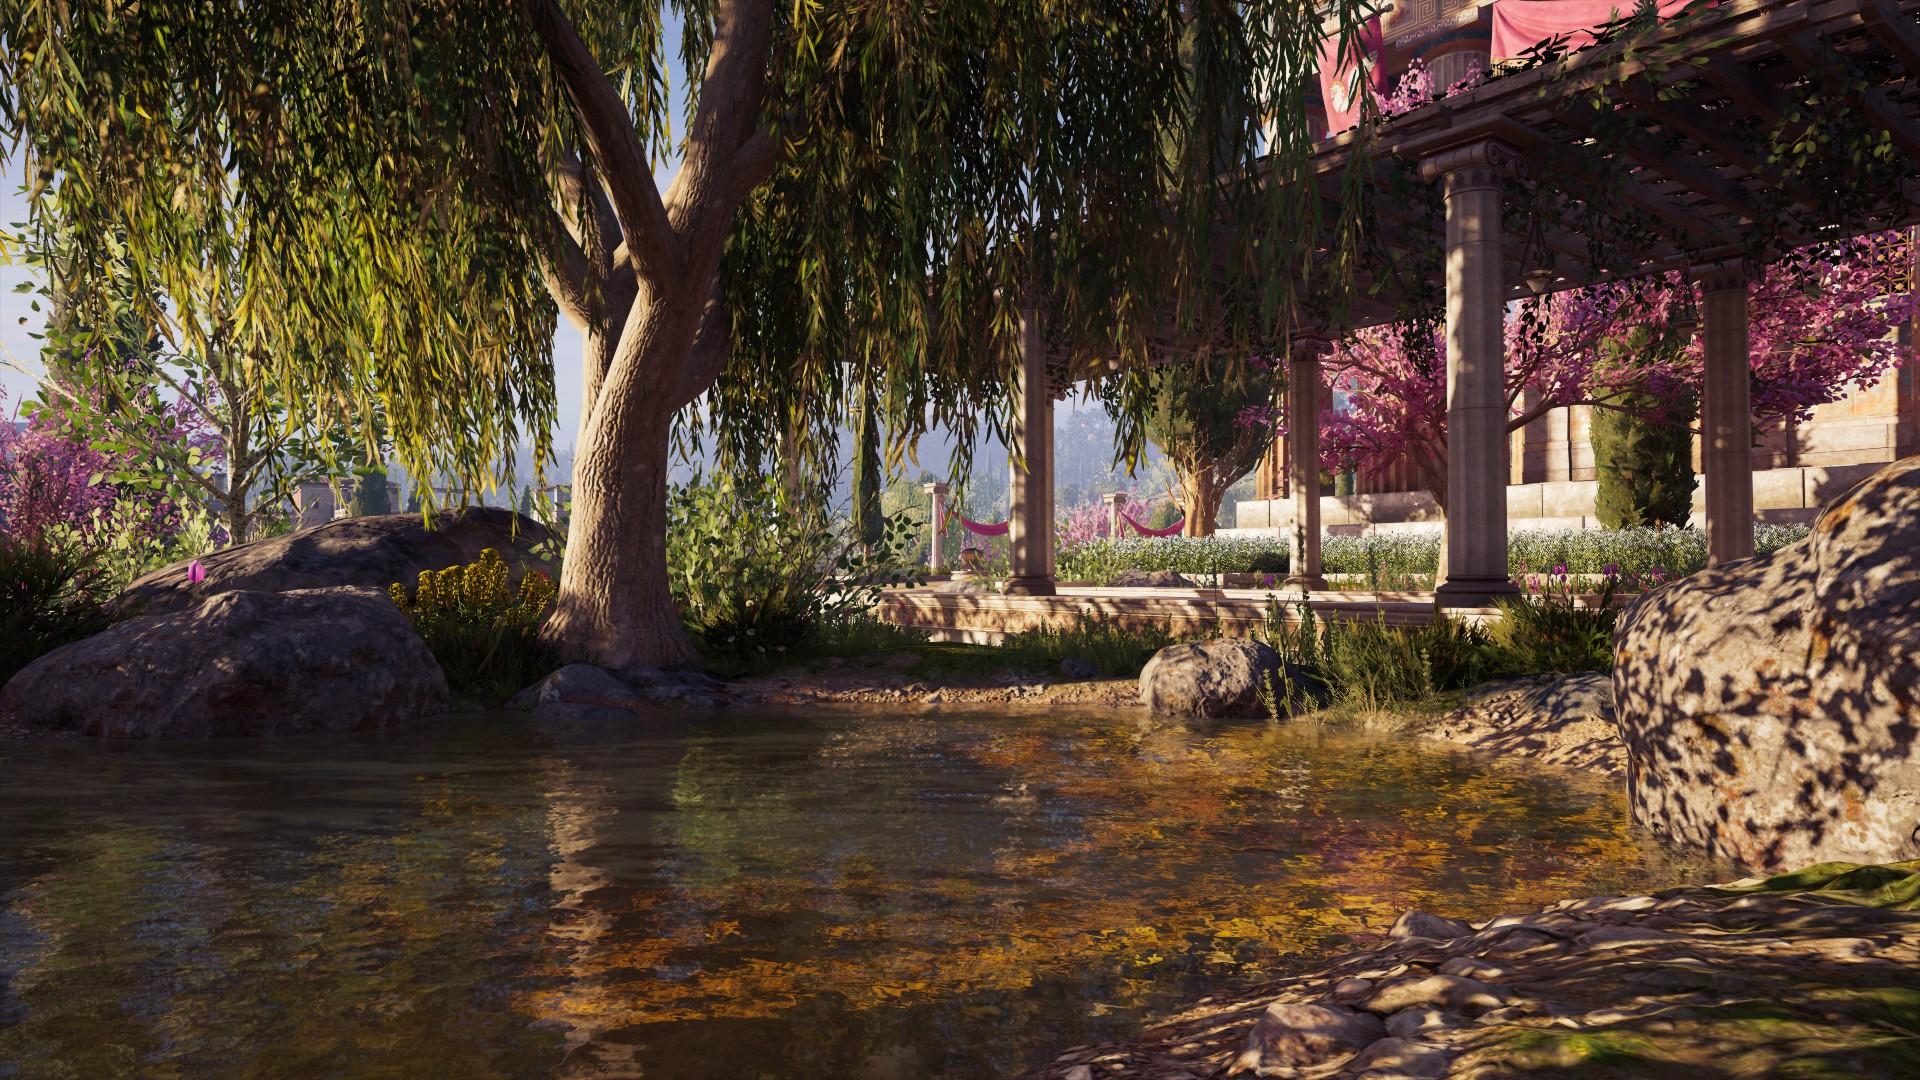 20181022222331_1.jpg - Assassin's Creed: Odyssey